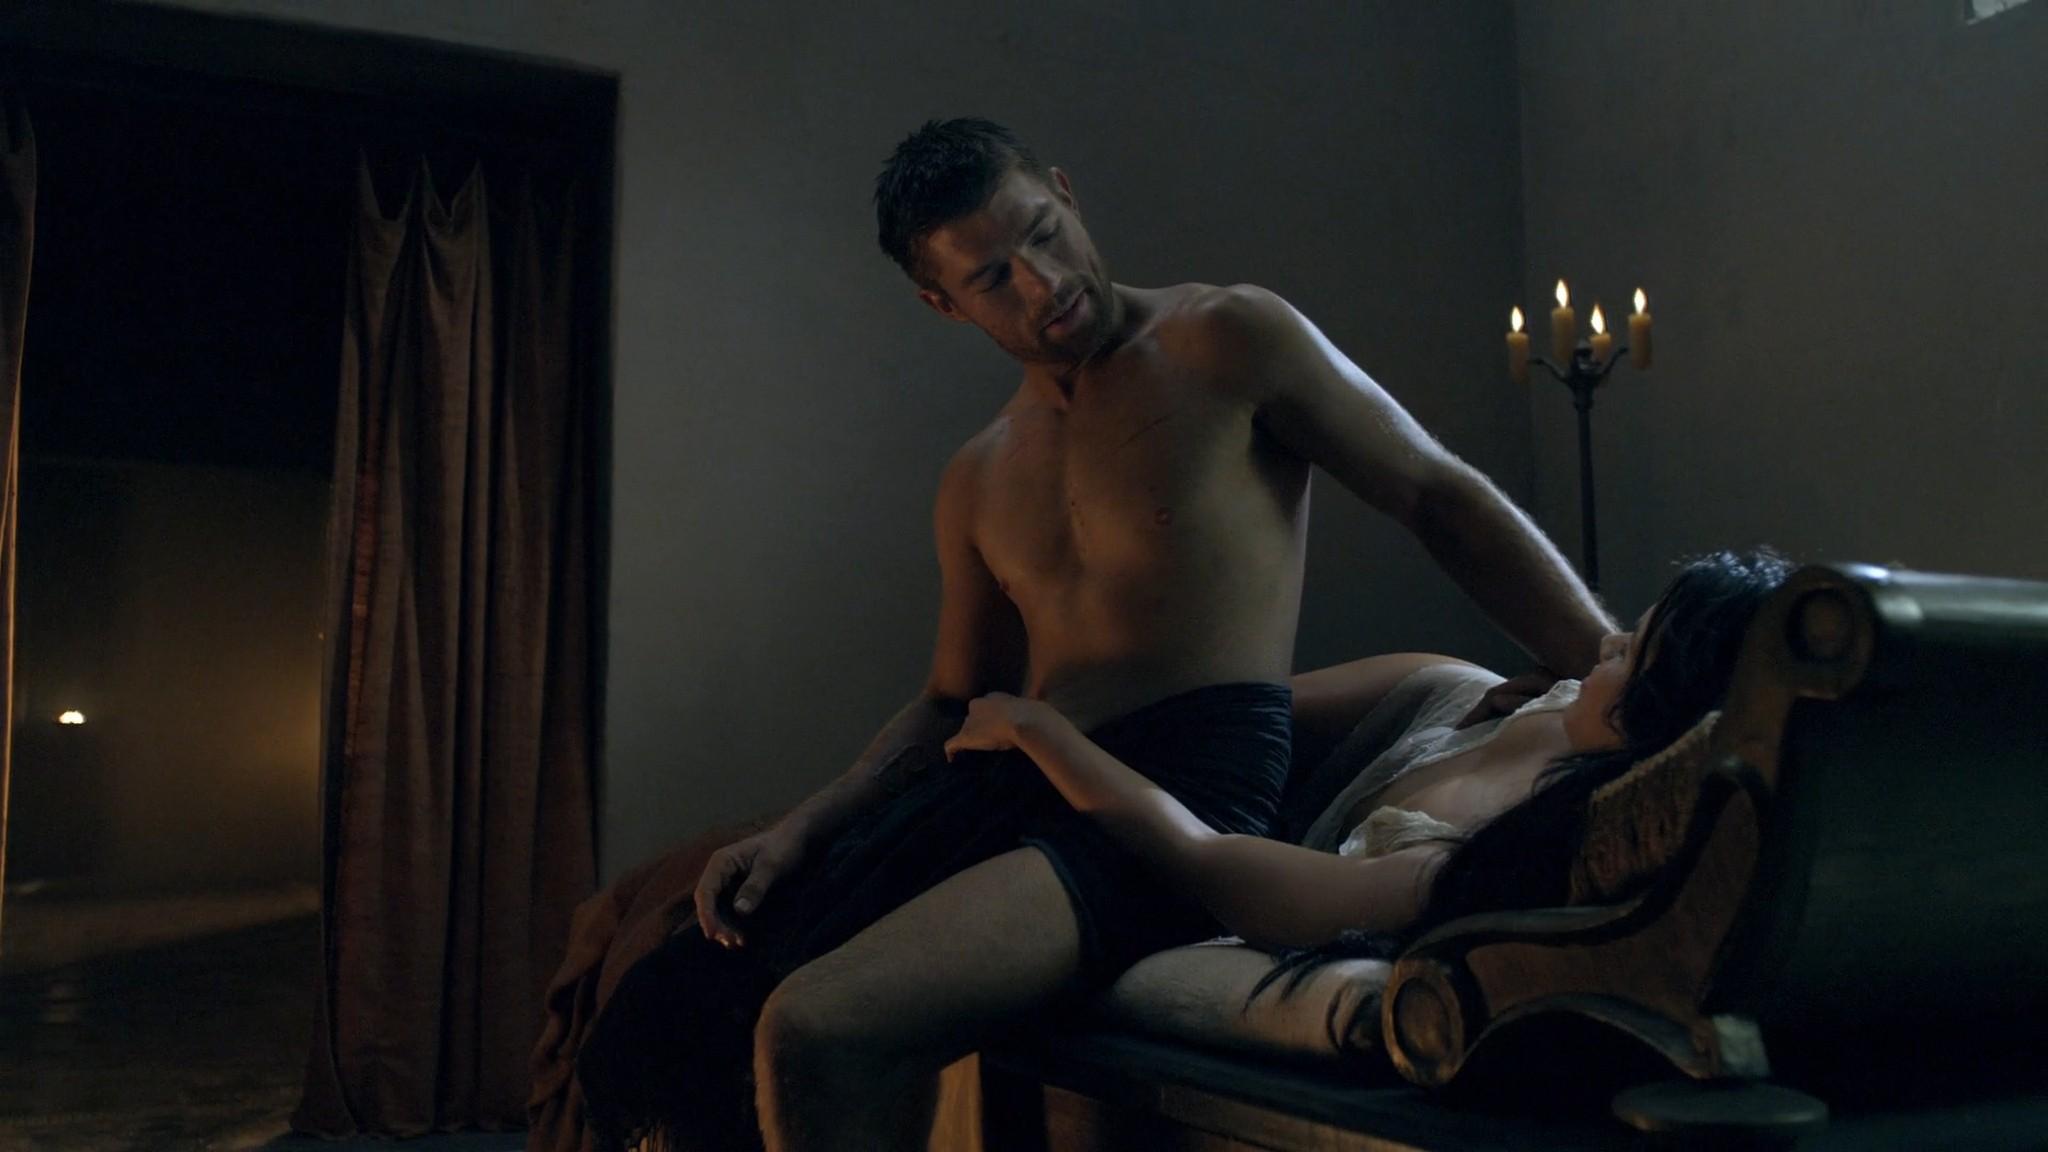 Viva Bianca nude Katrina Law, Bonnie Sveen all nude -Spartacus - Vengeance (2012) e2 1080p (6)